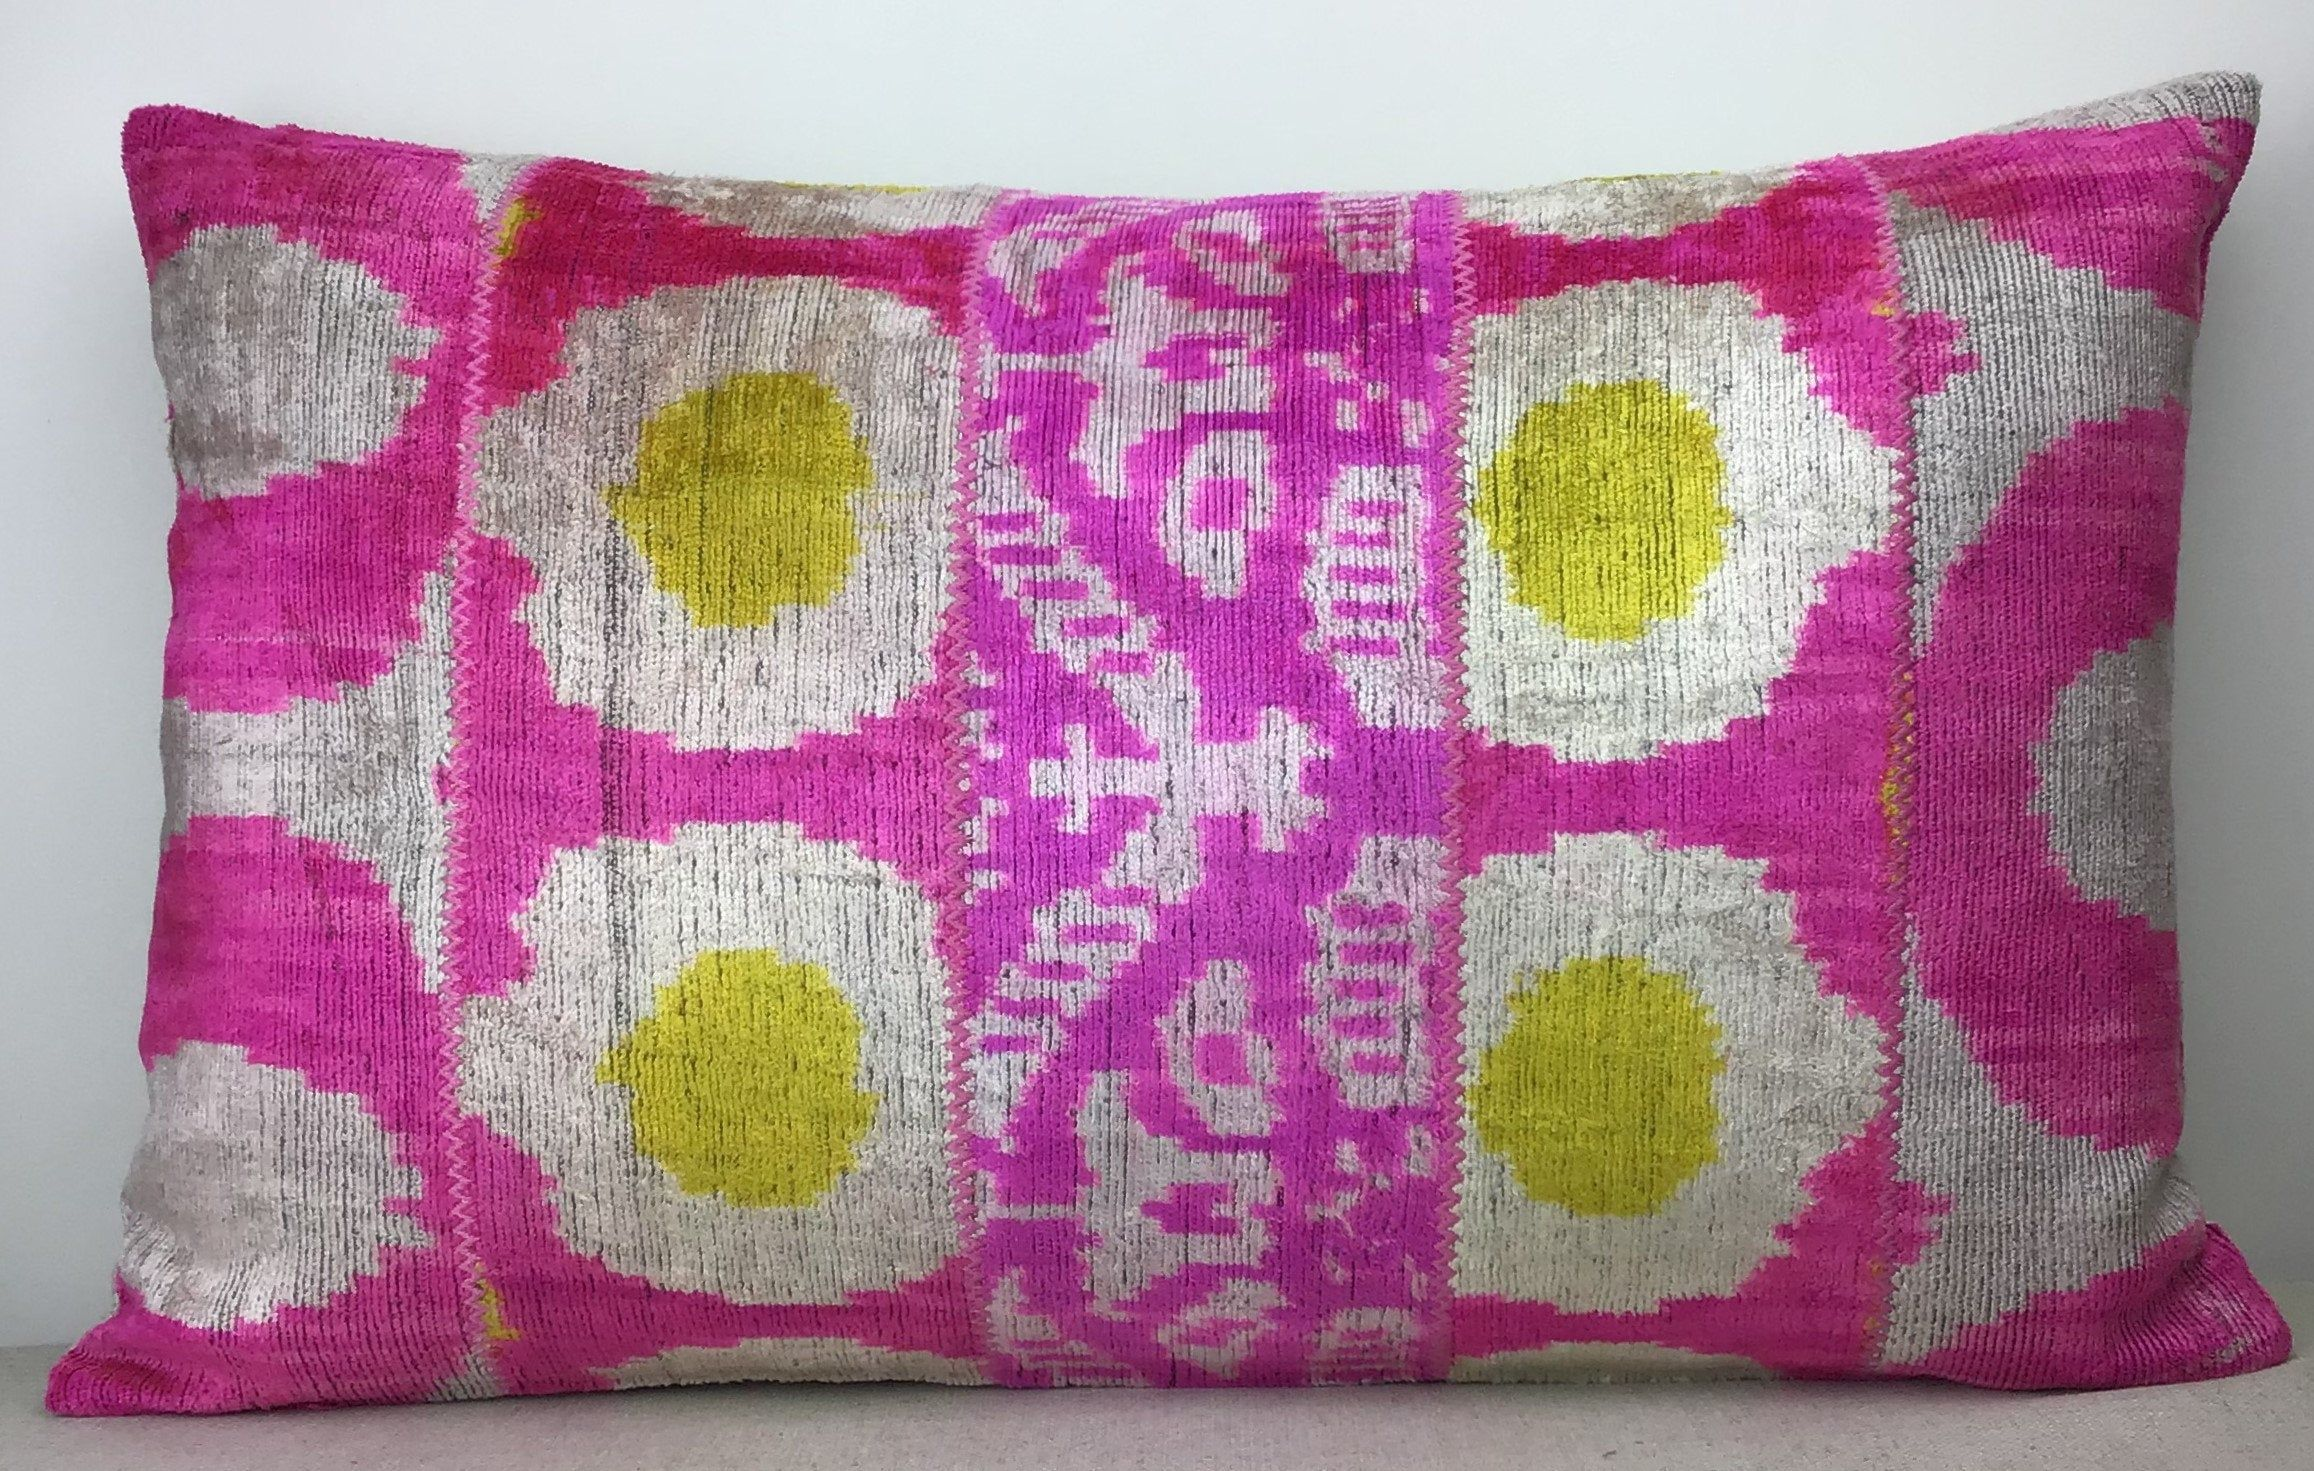 Luxury home decoration Decorative pillows 16 x 24 Silk velvet ikat pillow cover Double side ikat cushion,Handmade velvet ikat pillow